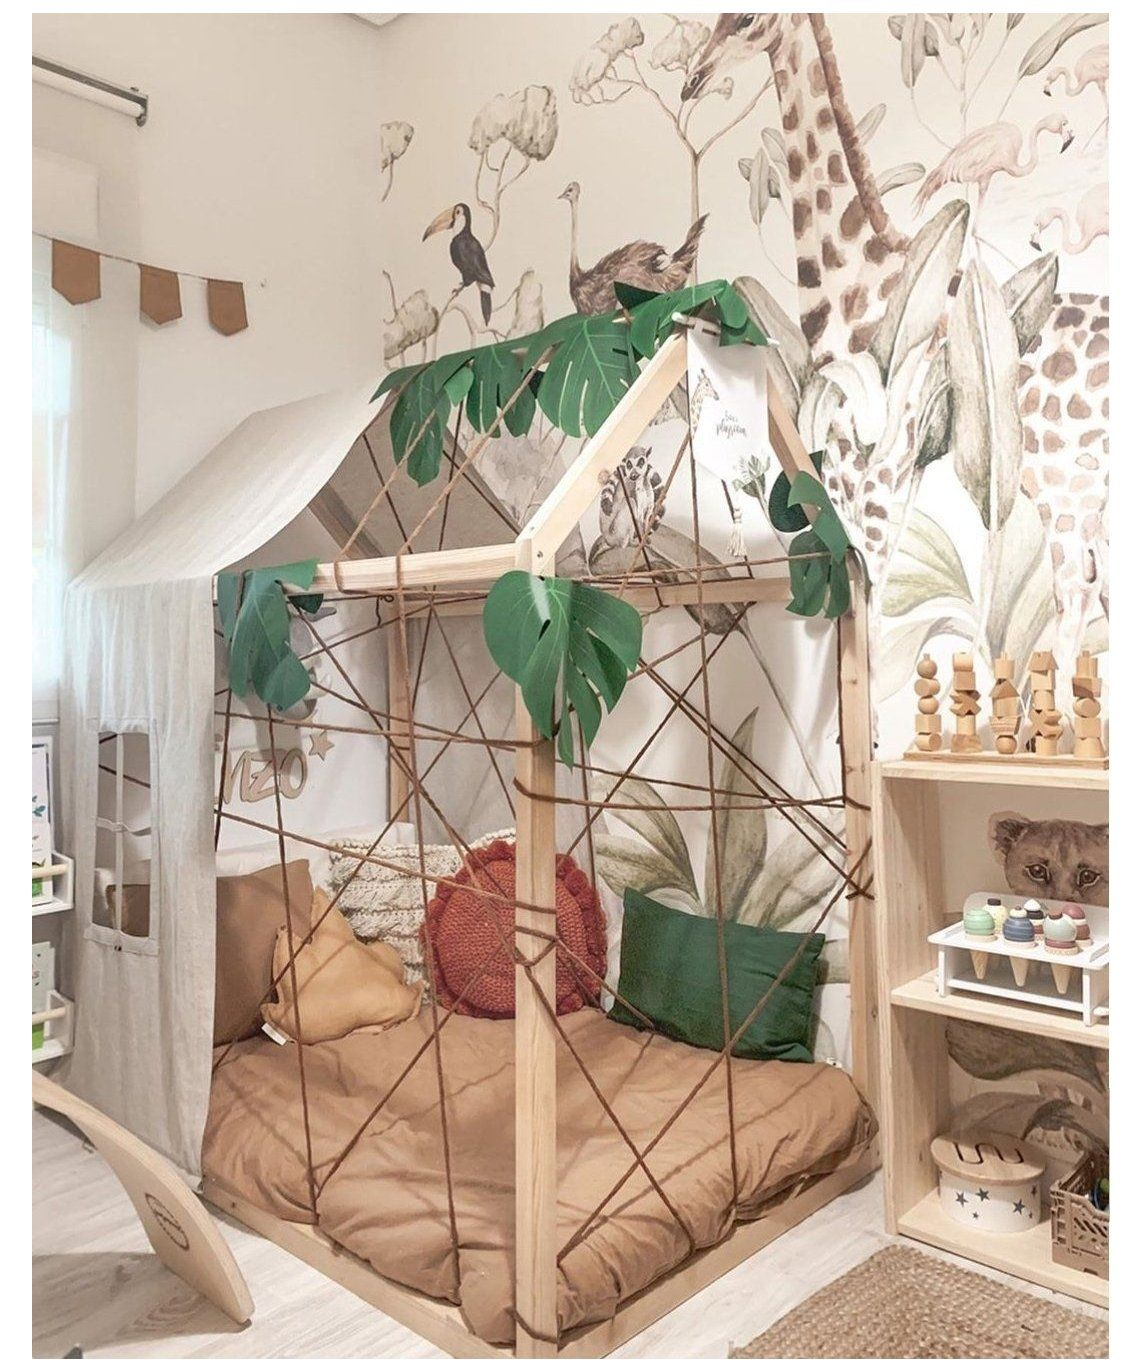 12 Brilliant Jungle Theme Kids Room Ideas Jungle Kids Room Ideas Junglekidsroomideas Here I V In 2021 Kids Jungle Room Jungle Theme Kids Room Jungle Bedroom Theme Toddler jungle bedroom ideas